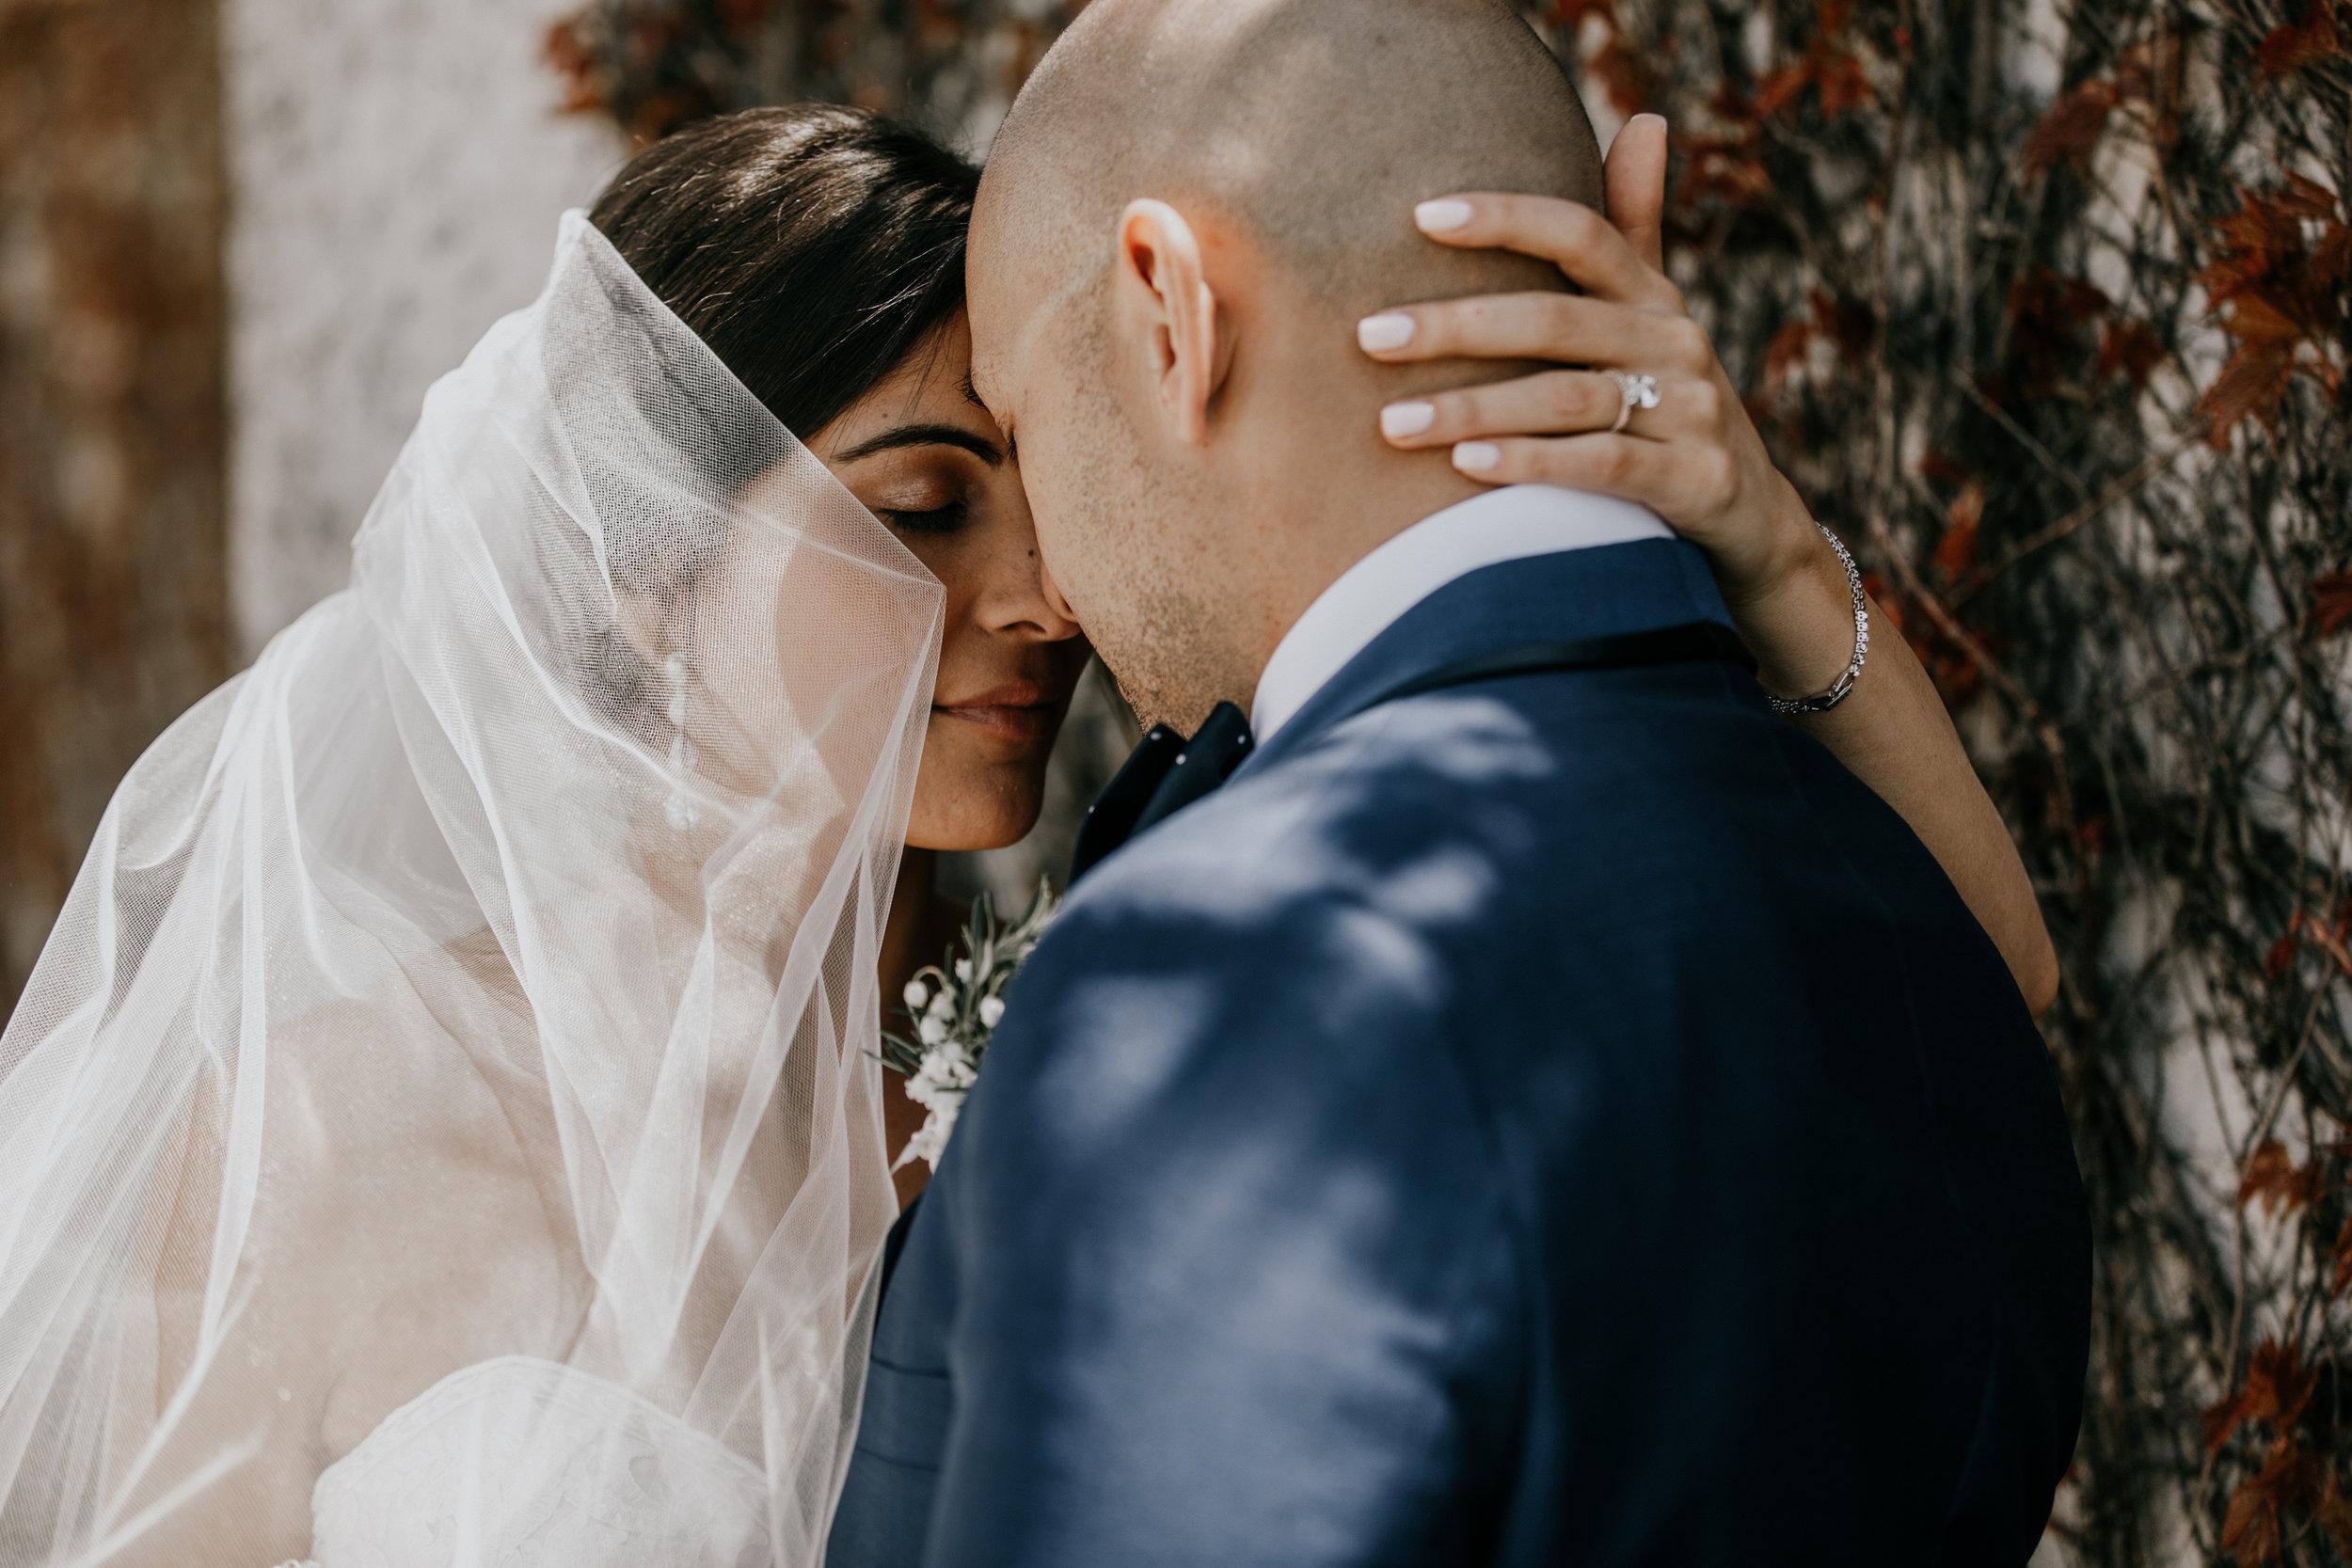 weddingphotographerboston.jpg